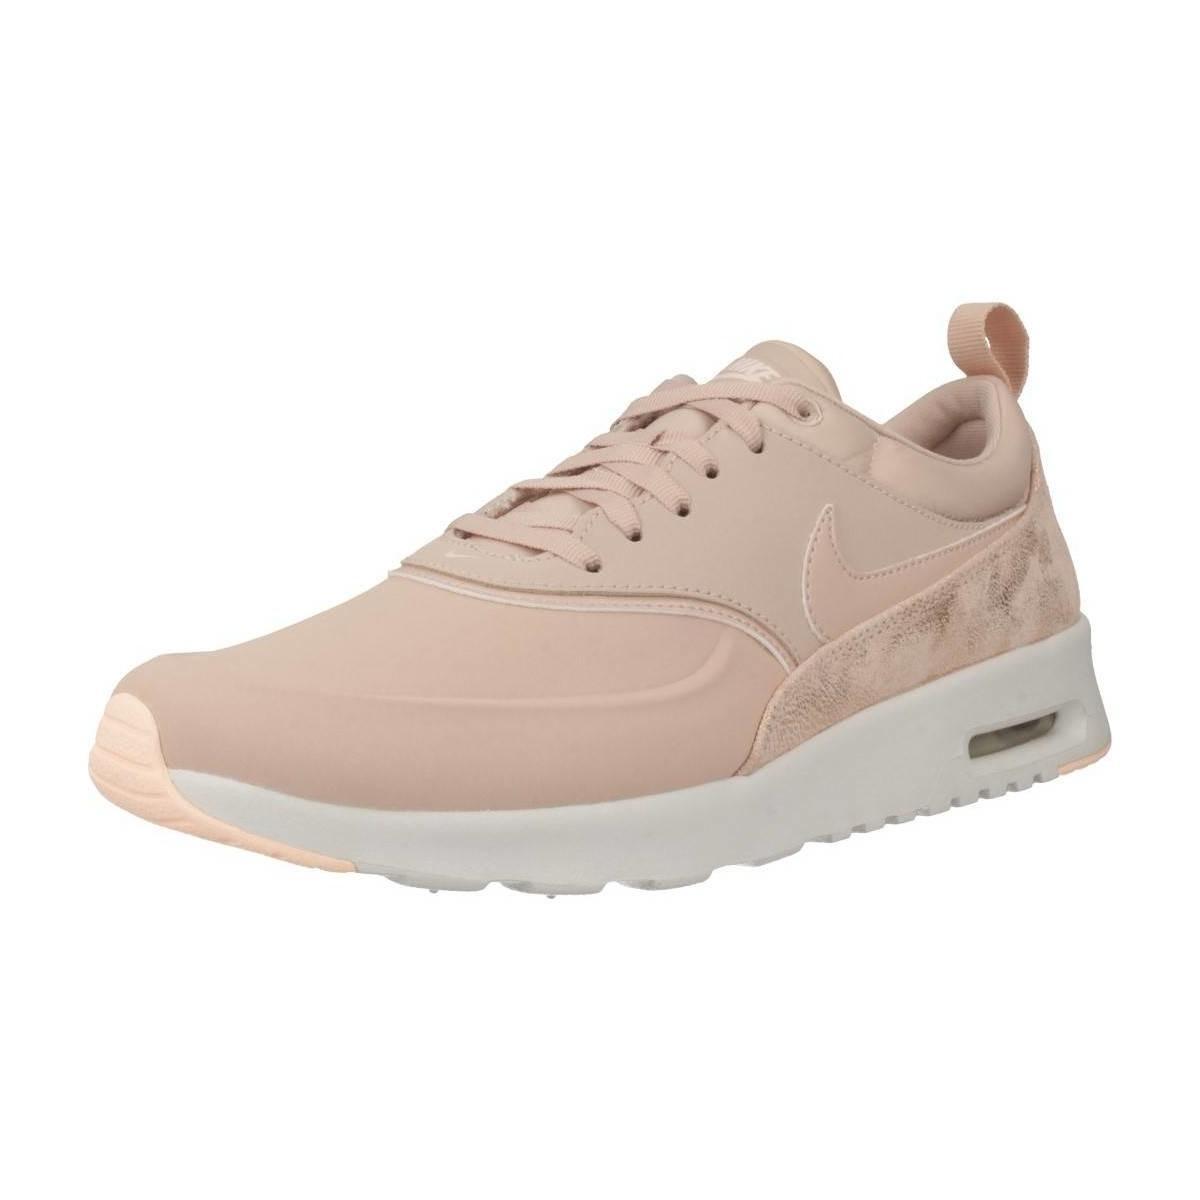 Women's Prm Pink Thea Air Max ShoestrainersIn Nike LVqSUMGzp